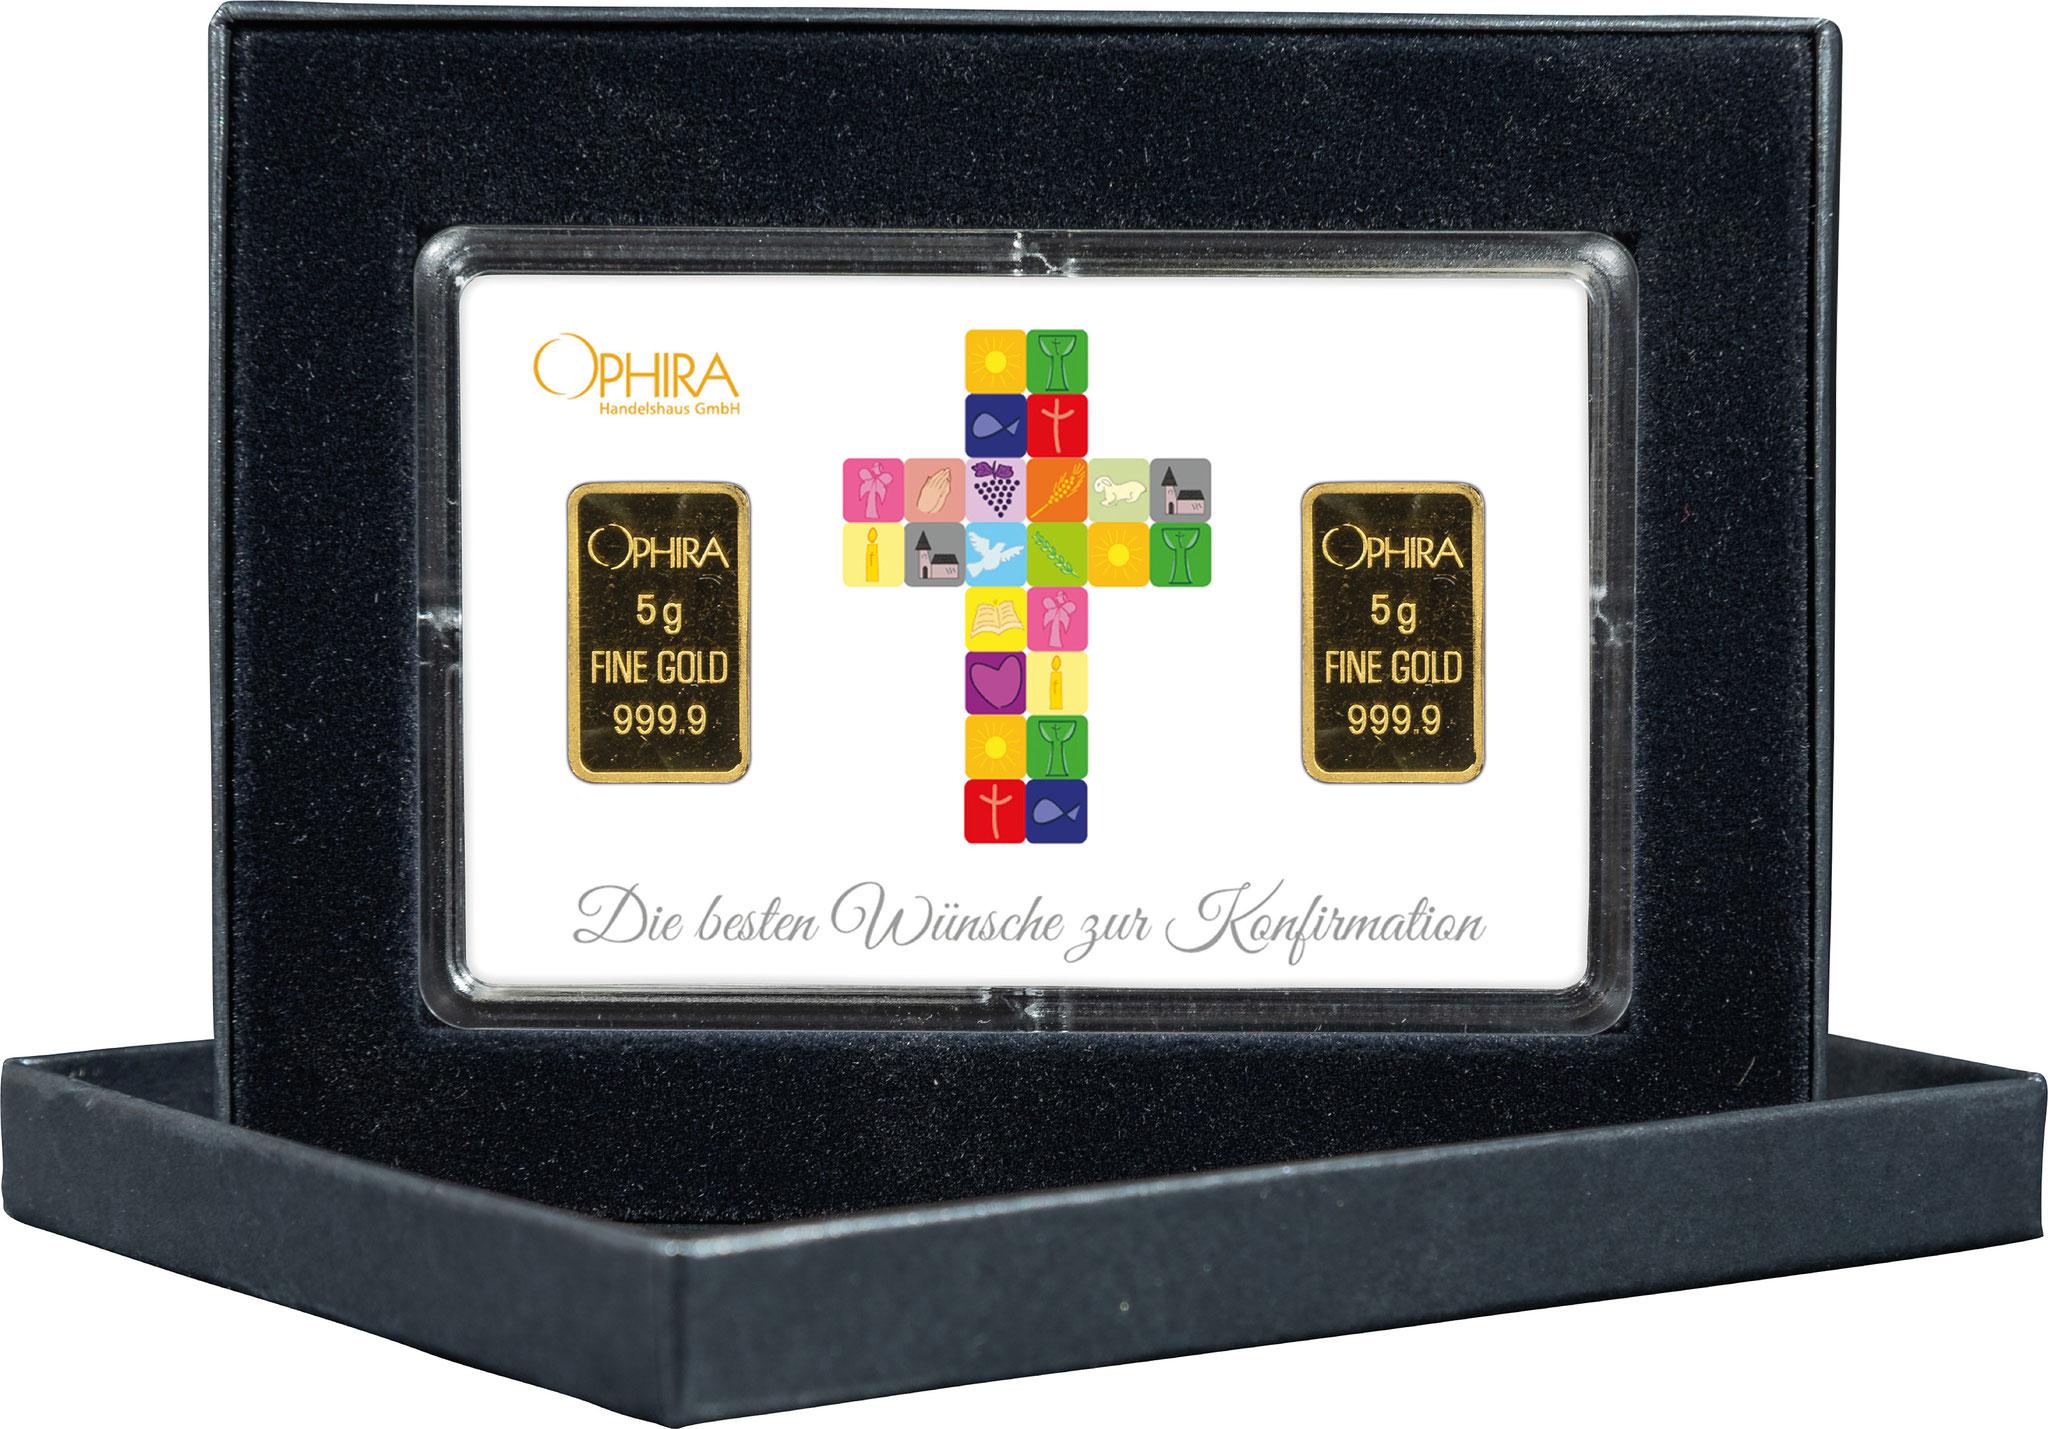 Geschenkbarren Konfirmation mit 2 Goldbarren in edlem Etui